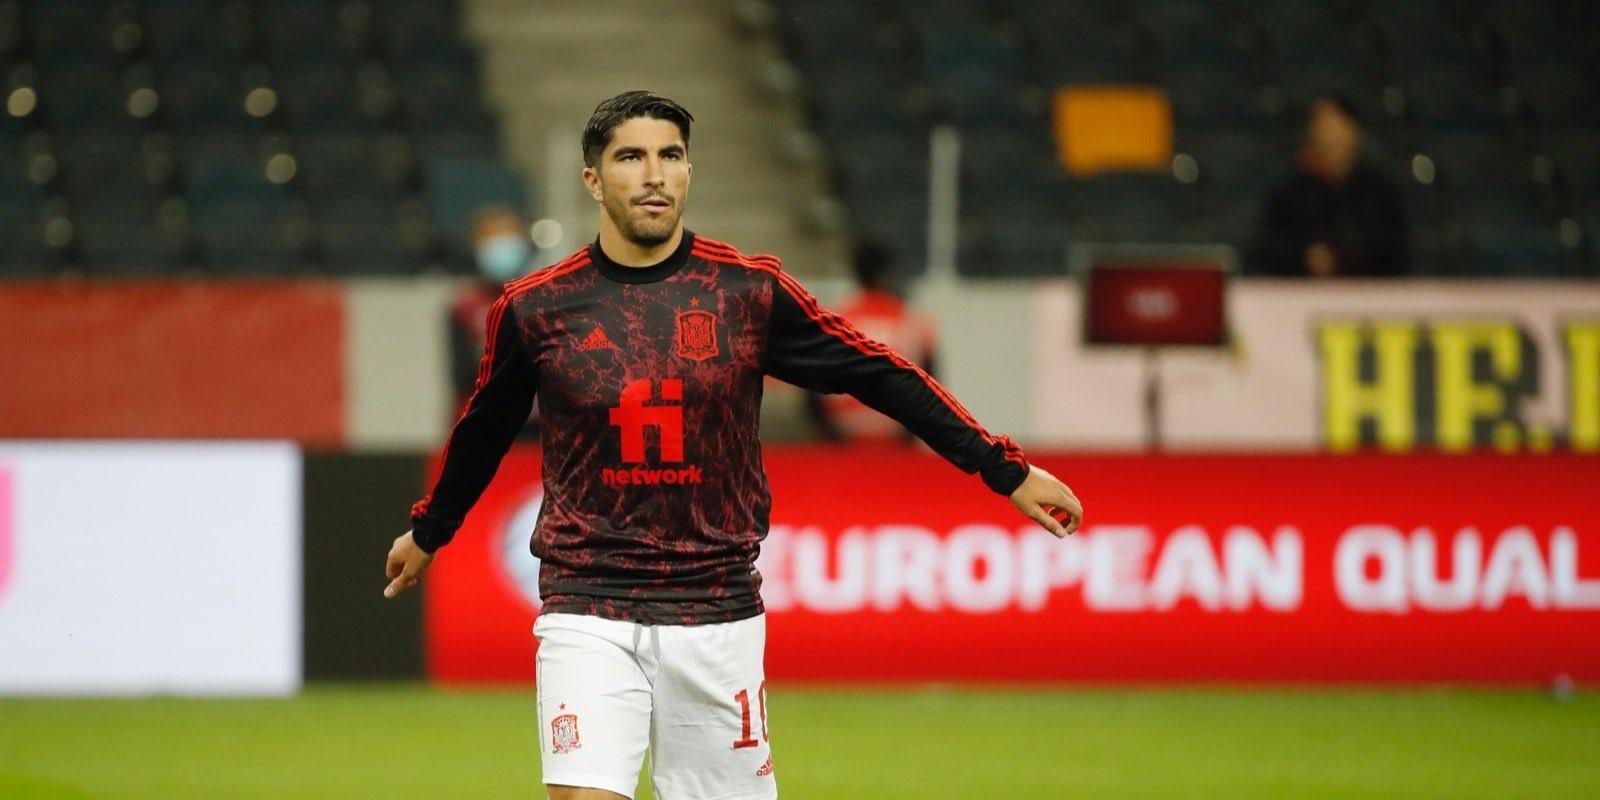 Liverpool identify versatile La Liga midfielder with appetite for goals as potential target – fichajes